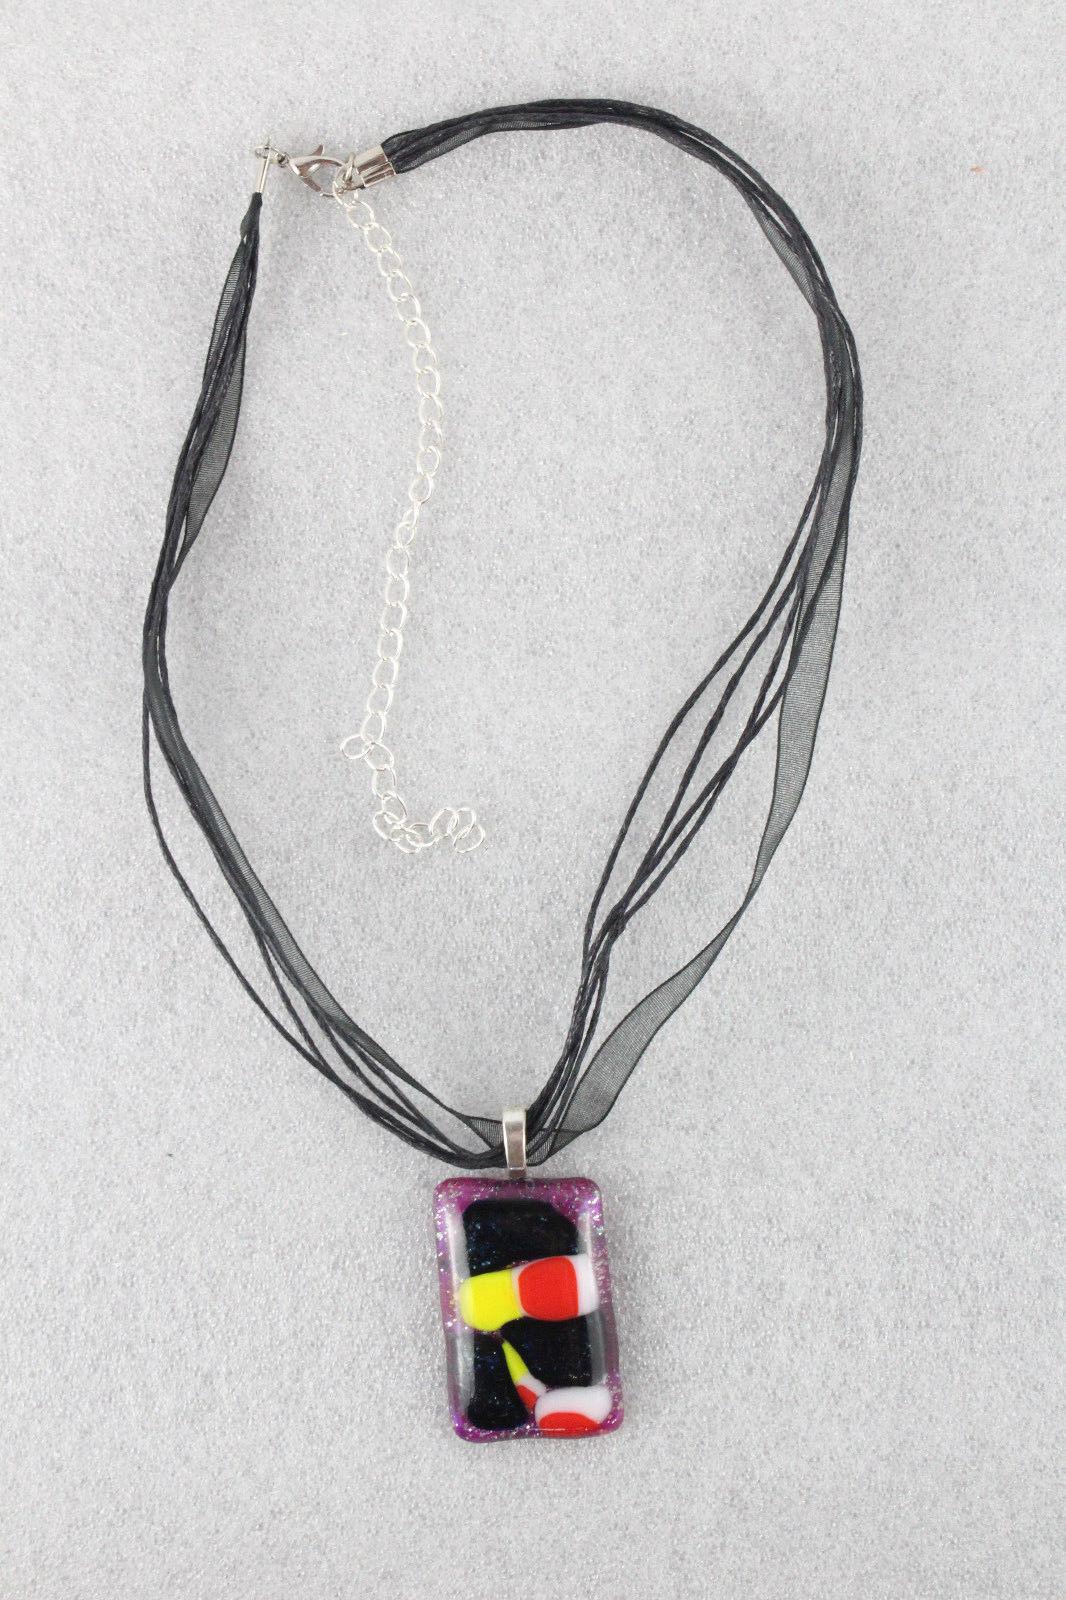 Elegant Handmade Casual Coloured Fused Glass Pendant Necklace + Cord #EM005